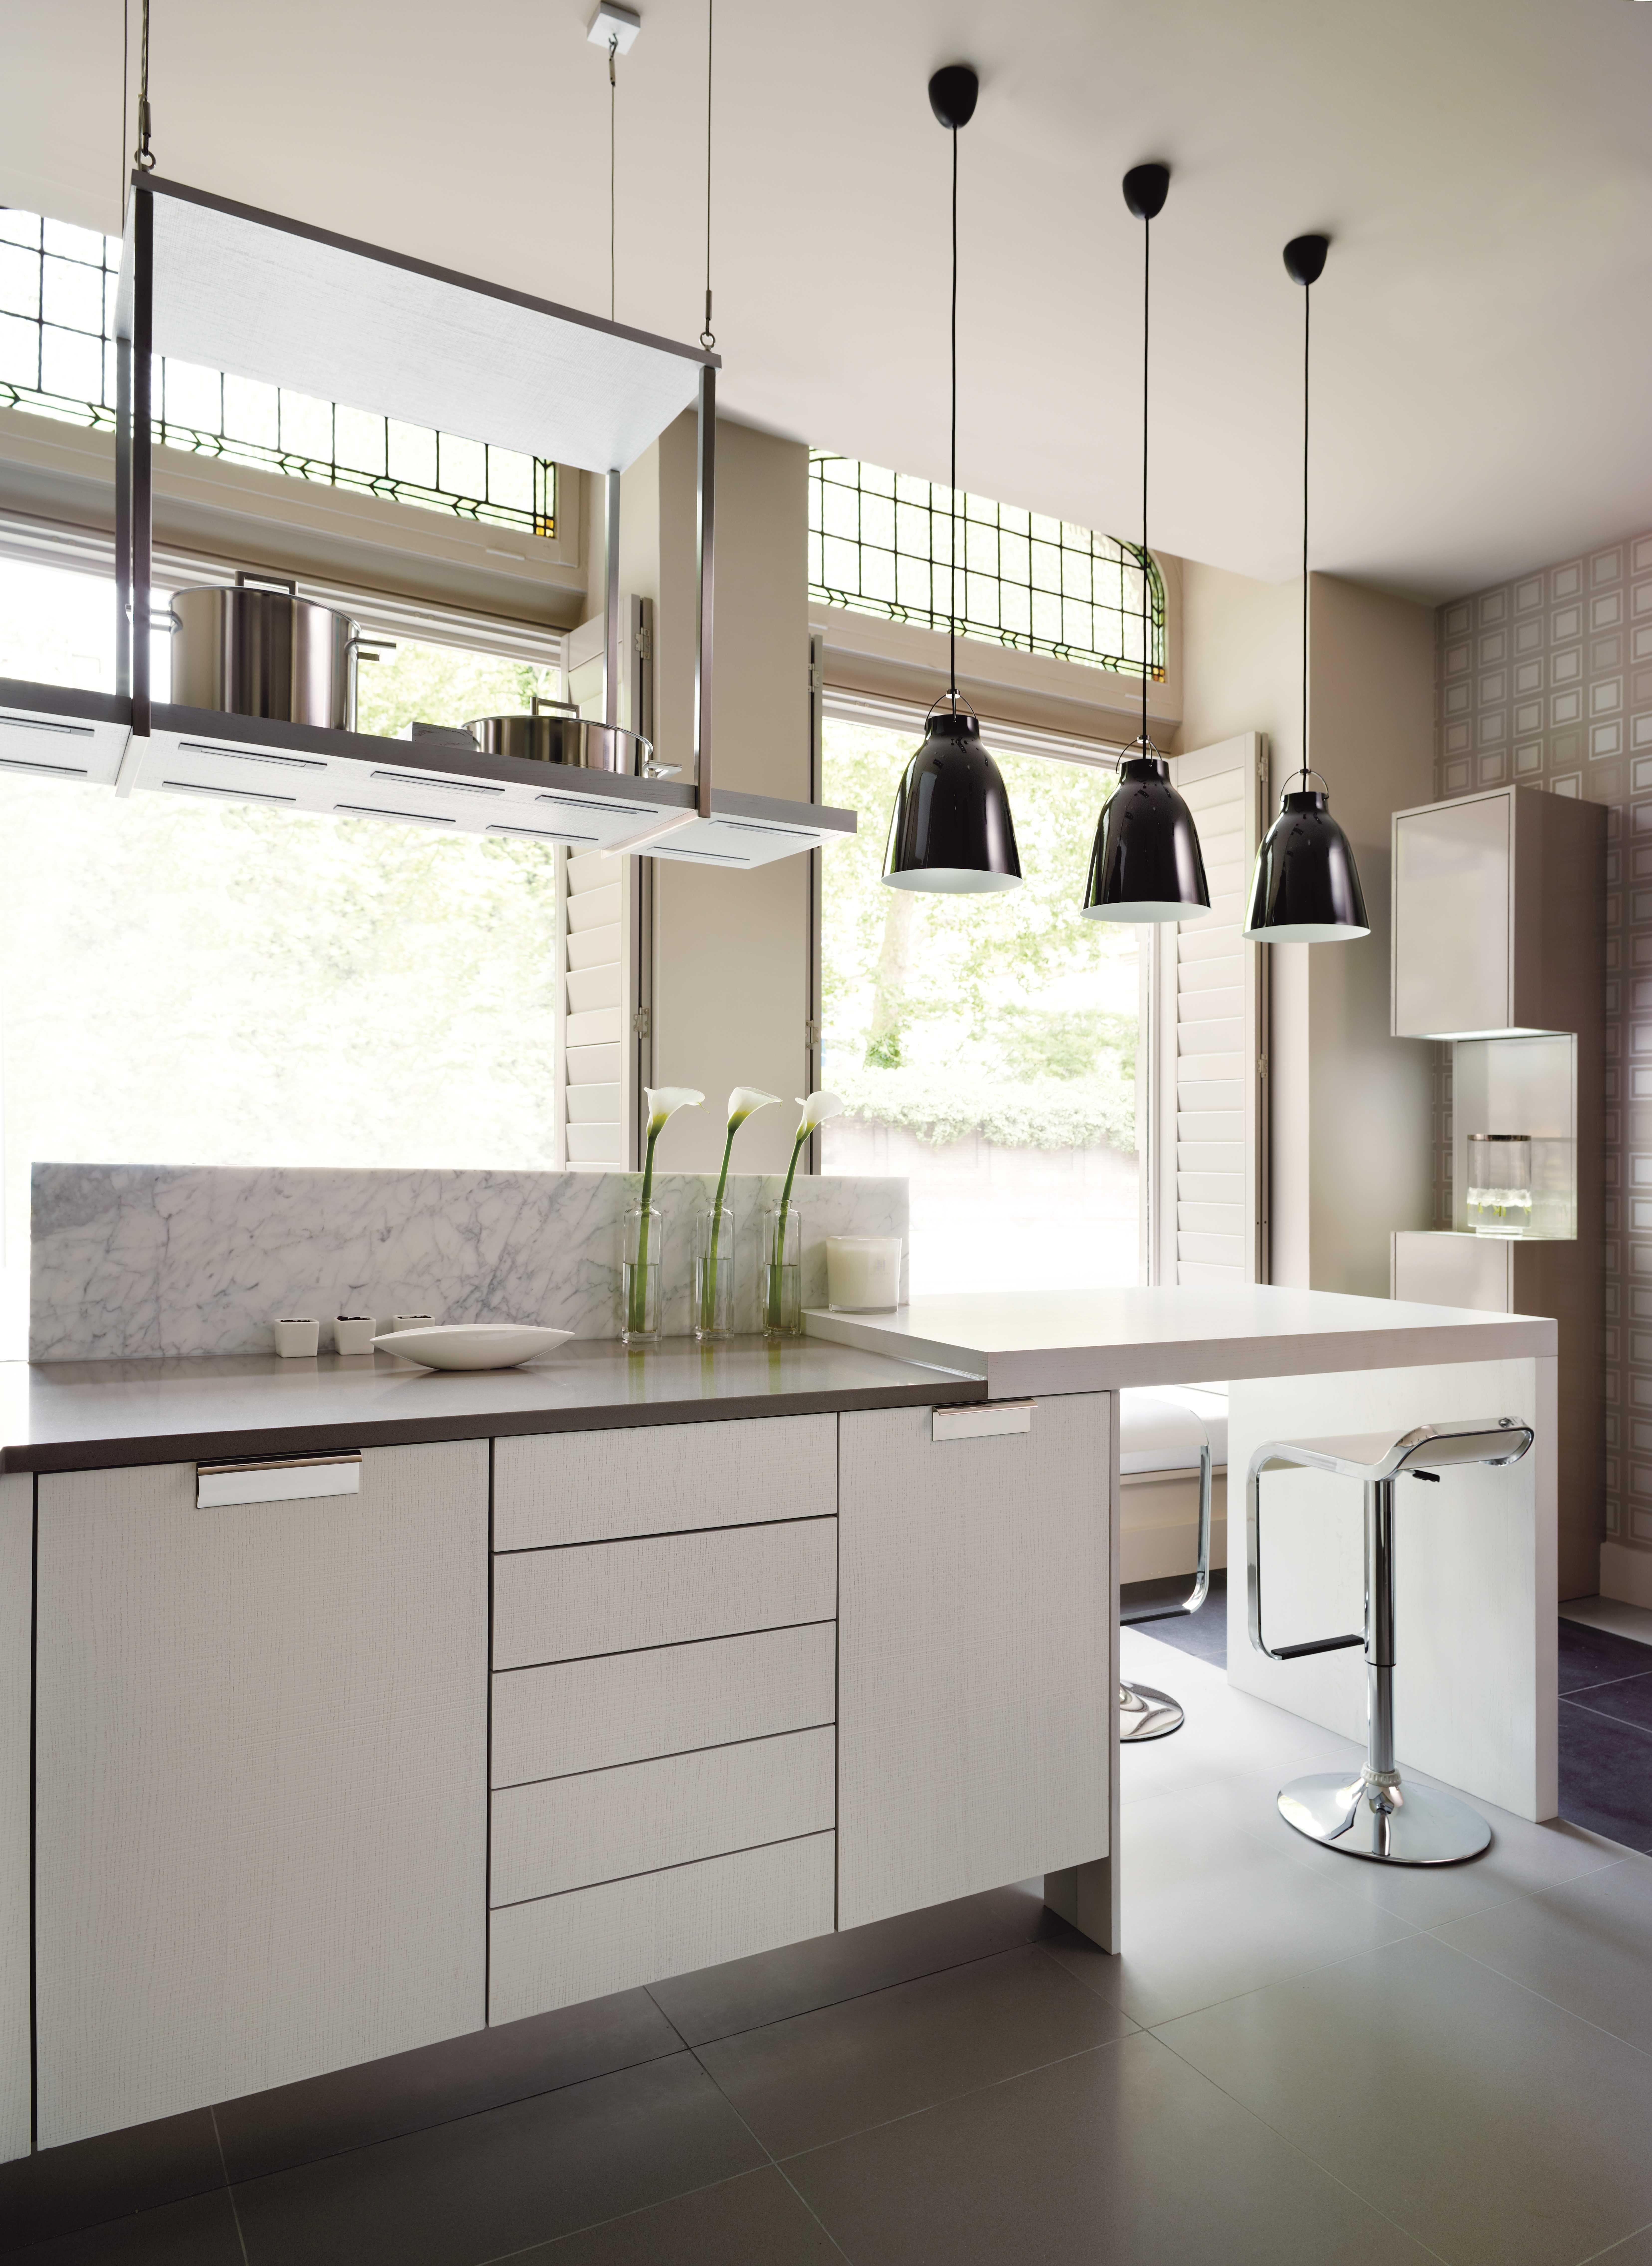 Best Smallbone Kitchen By Kelly Hoppen Kitchen Inspiration 400 x 300